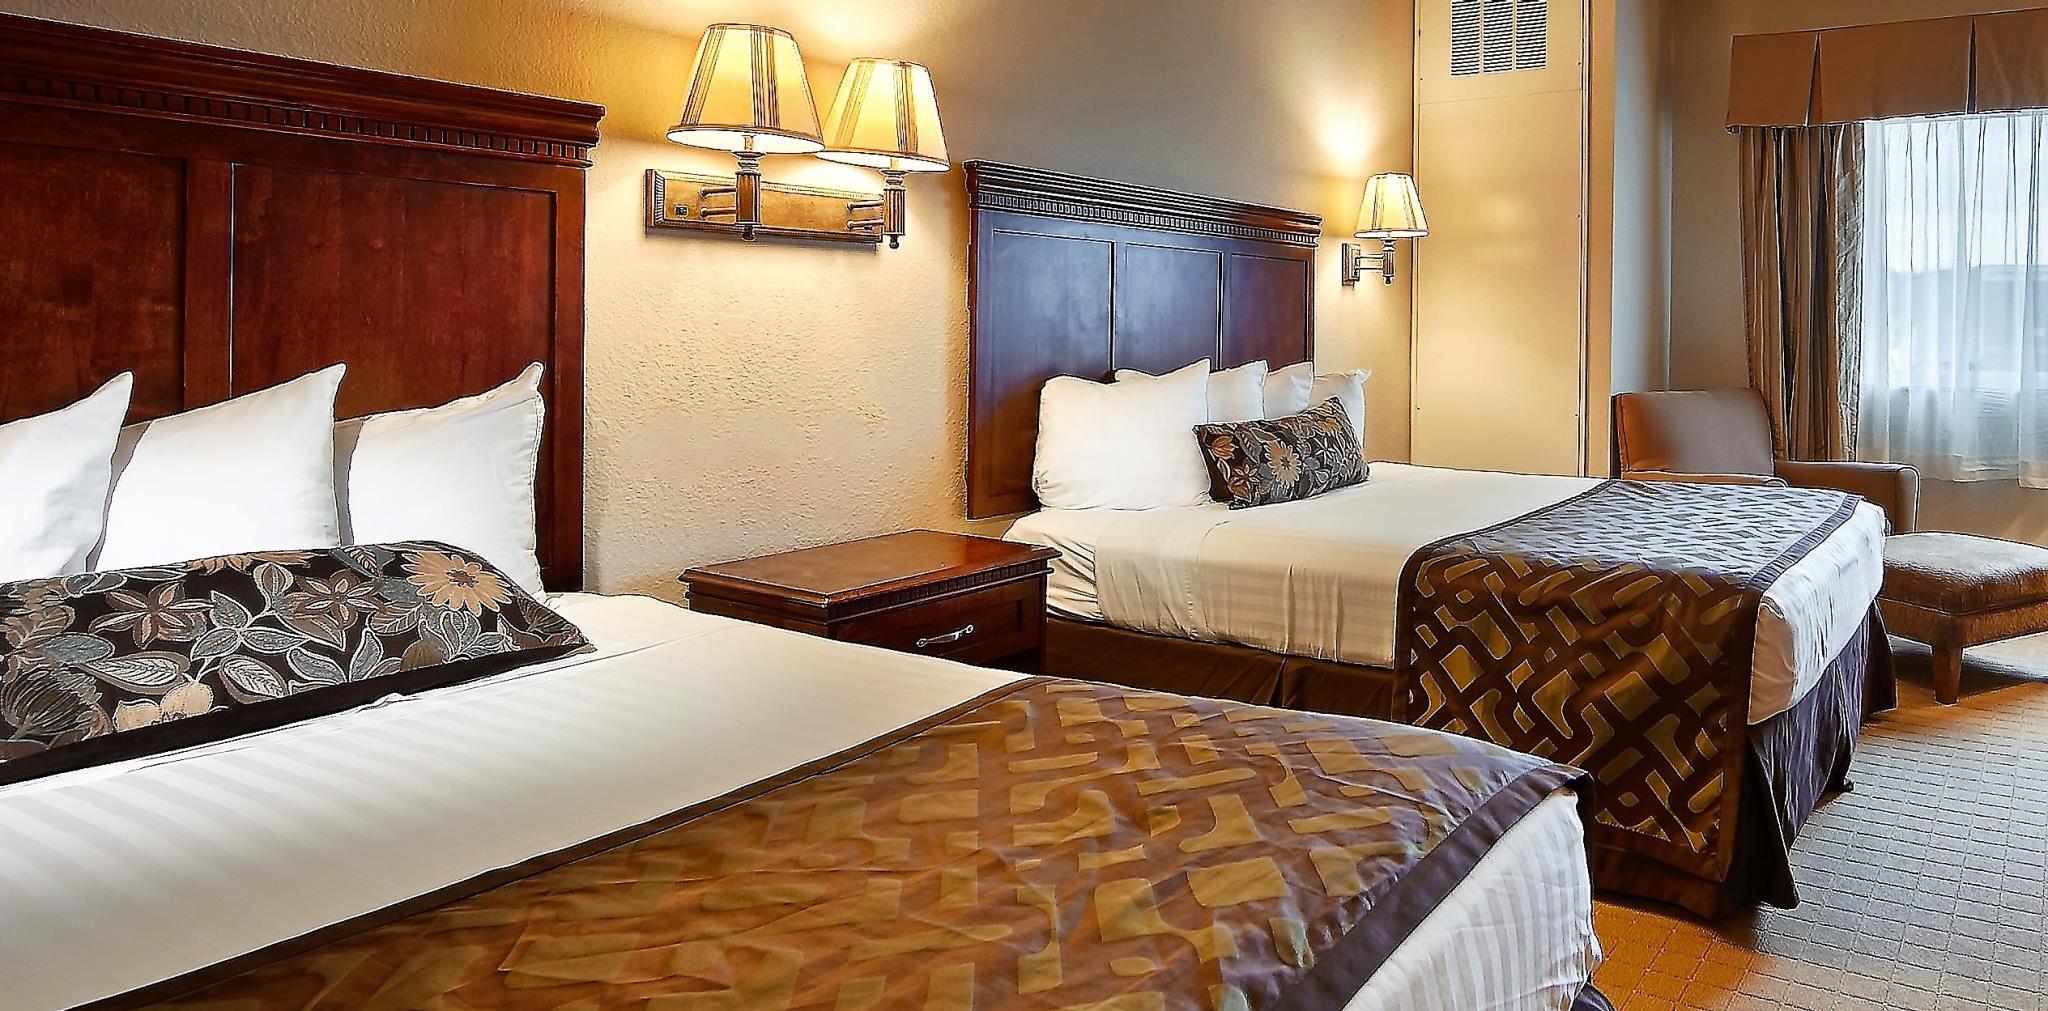 Timber Creek Inn & Suites, Kendall